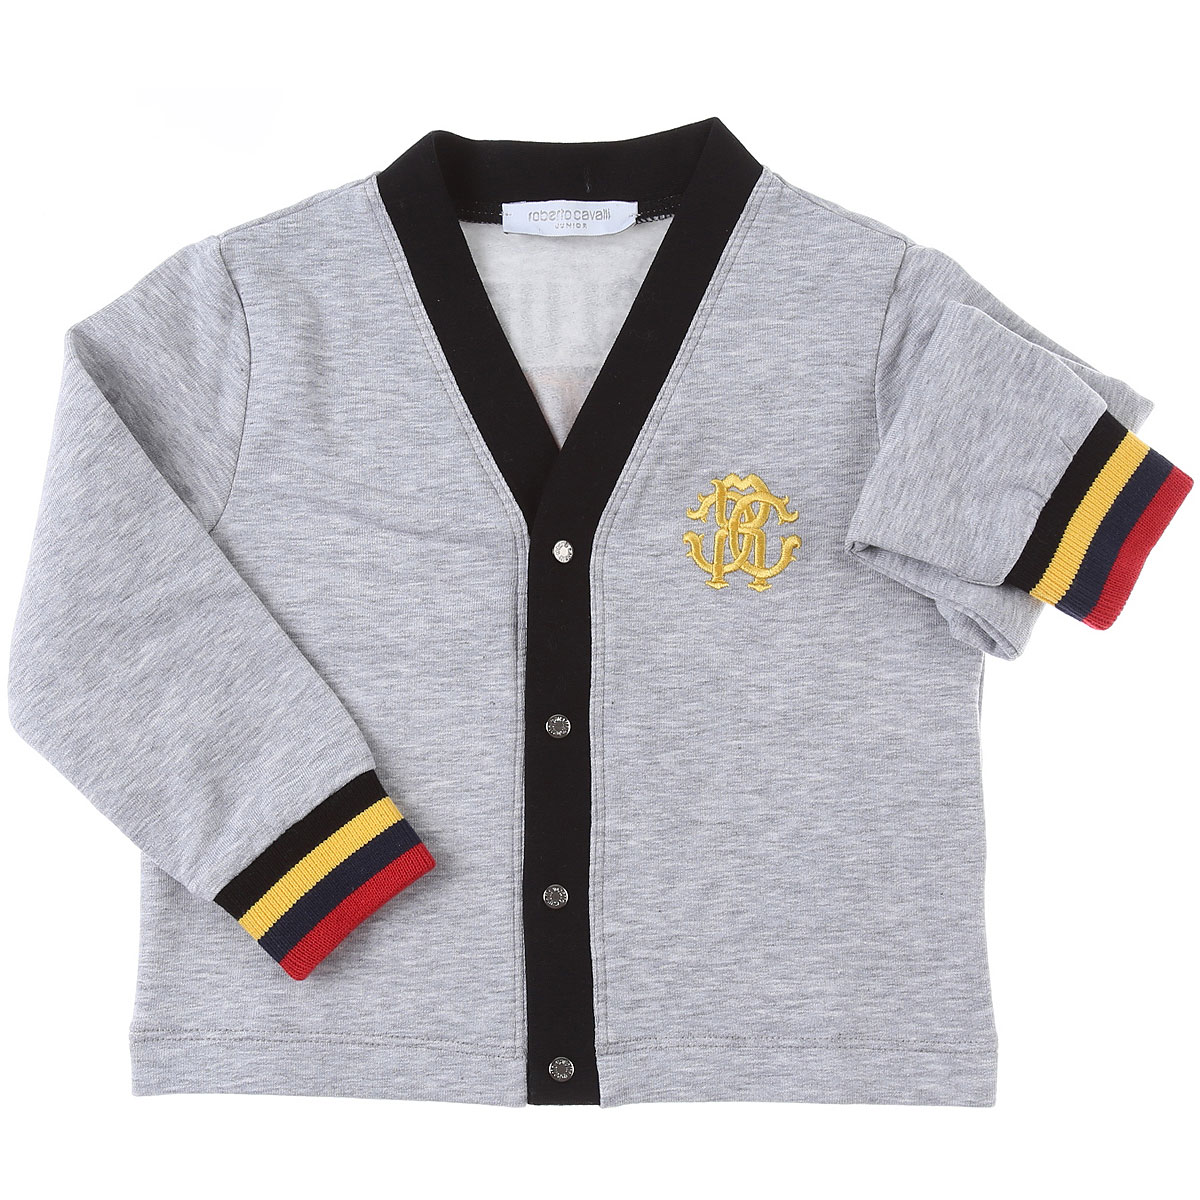 Roberto Cavalli Baby Sweaters for Boys On Sale, Grey, Cotton, 2019, 12 M 18M 2Y 3Y